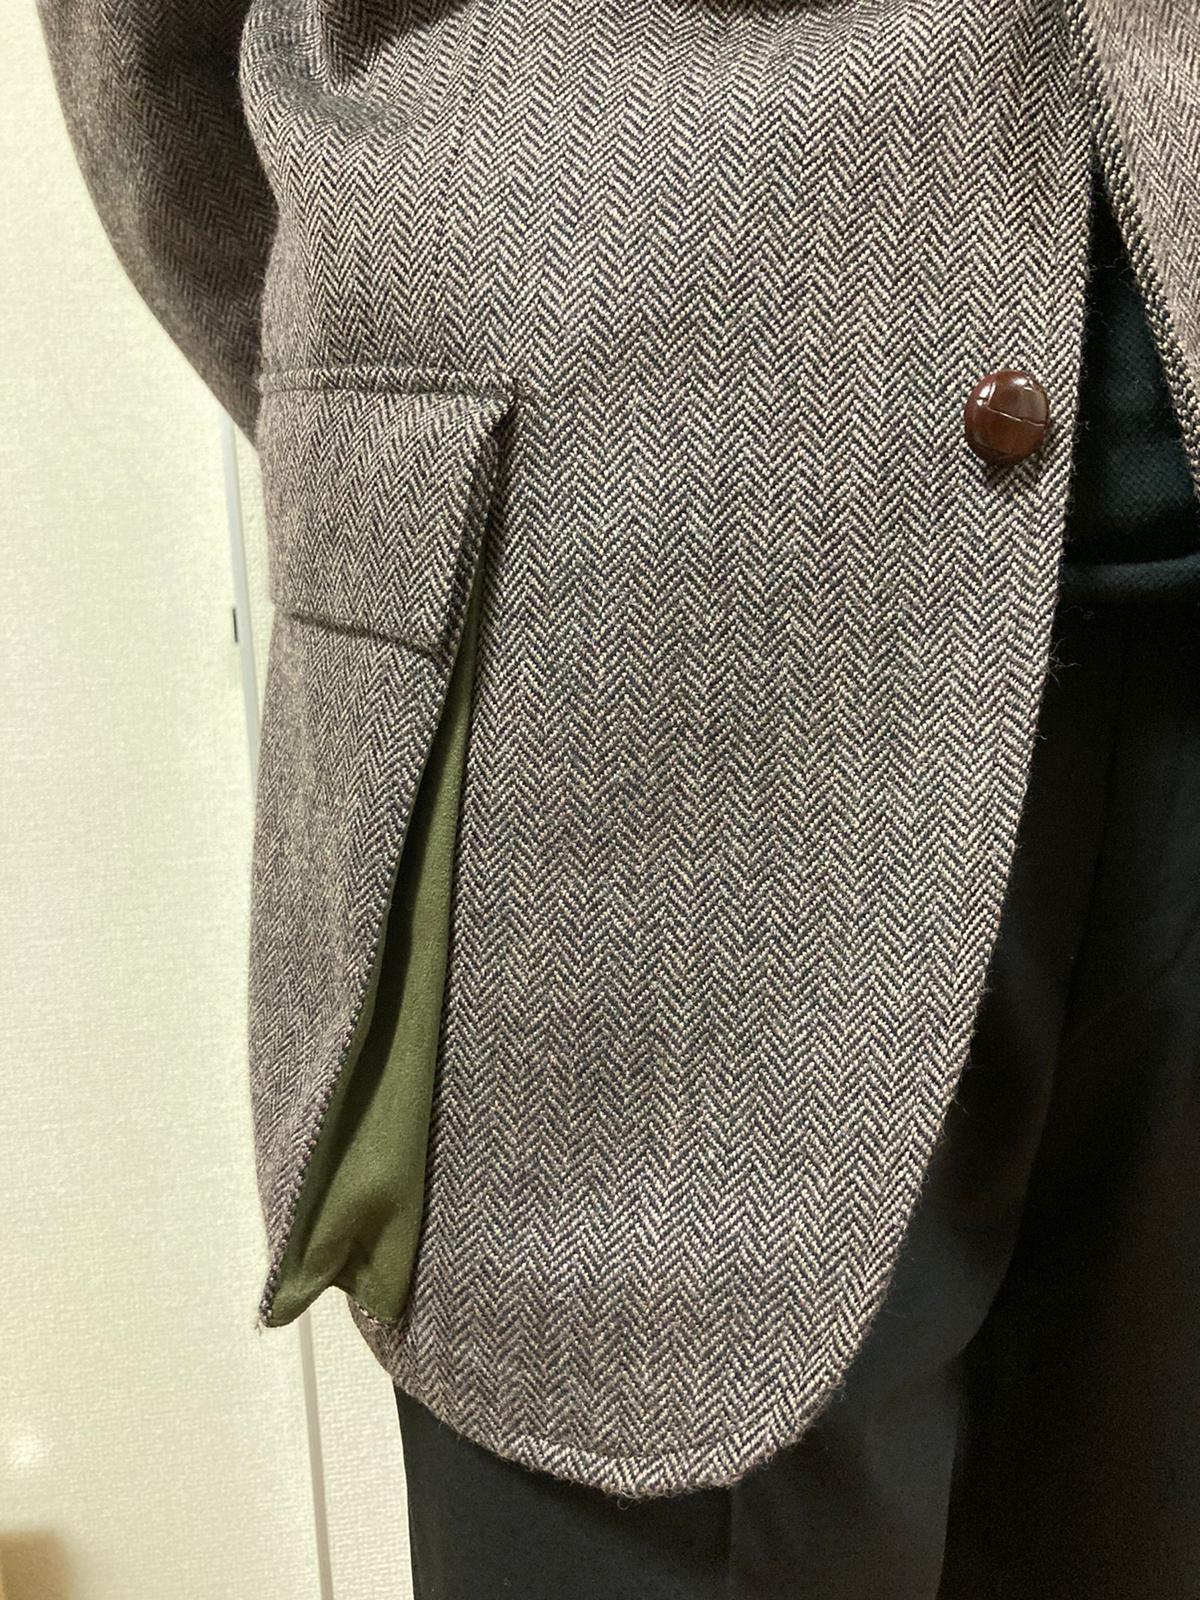 Norfolk Jacket bellows patch pocket